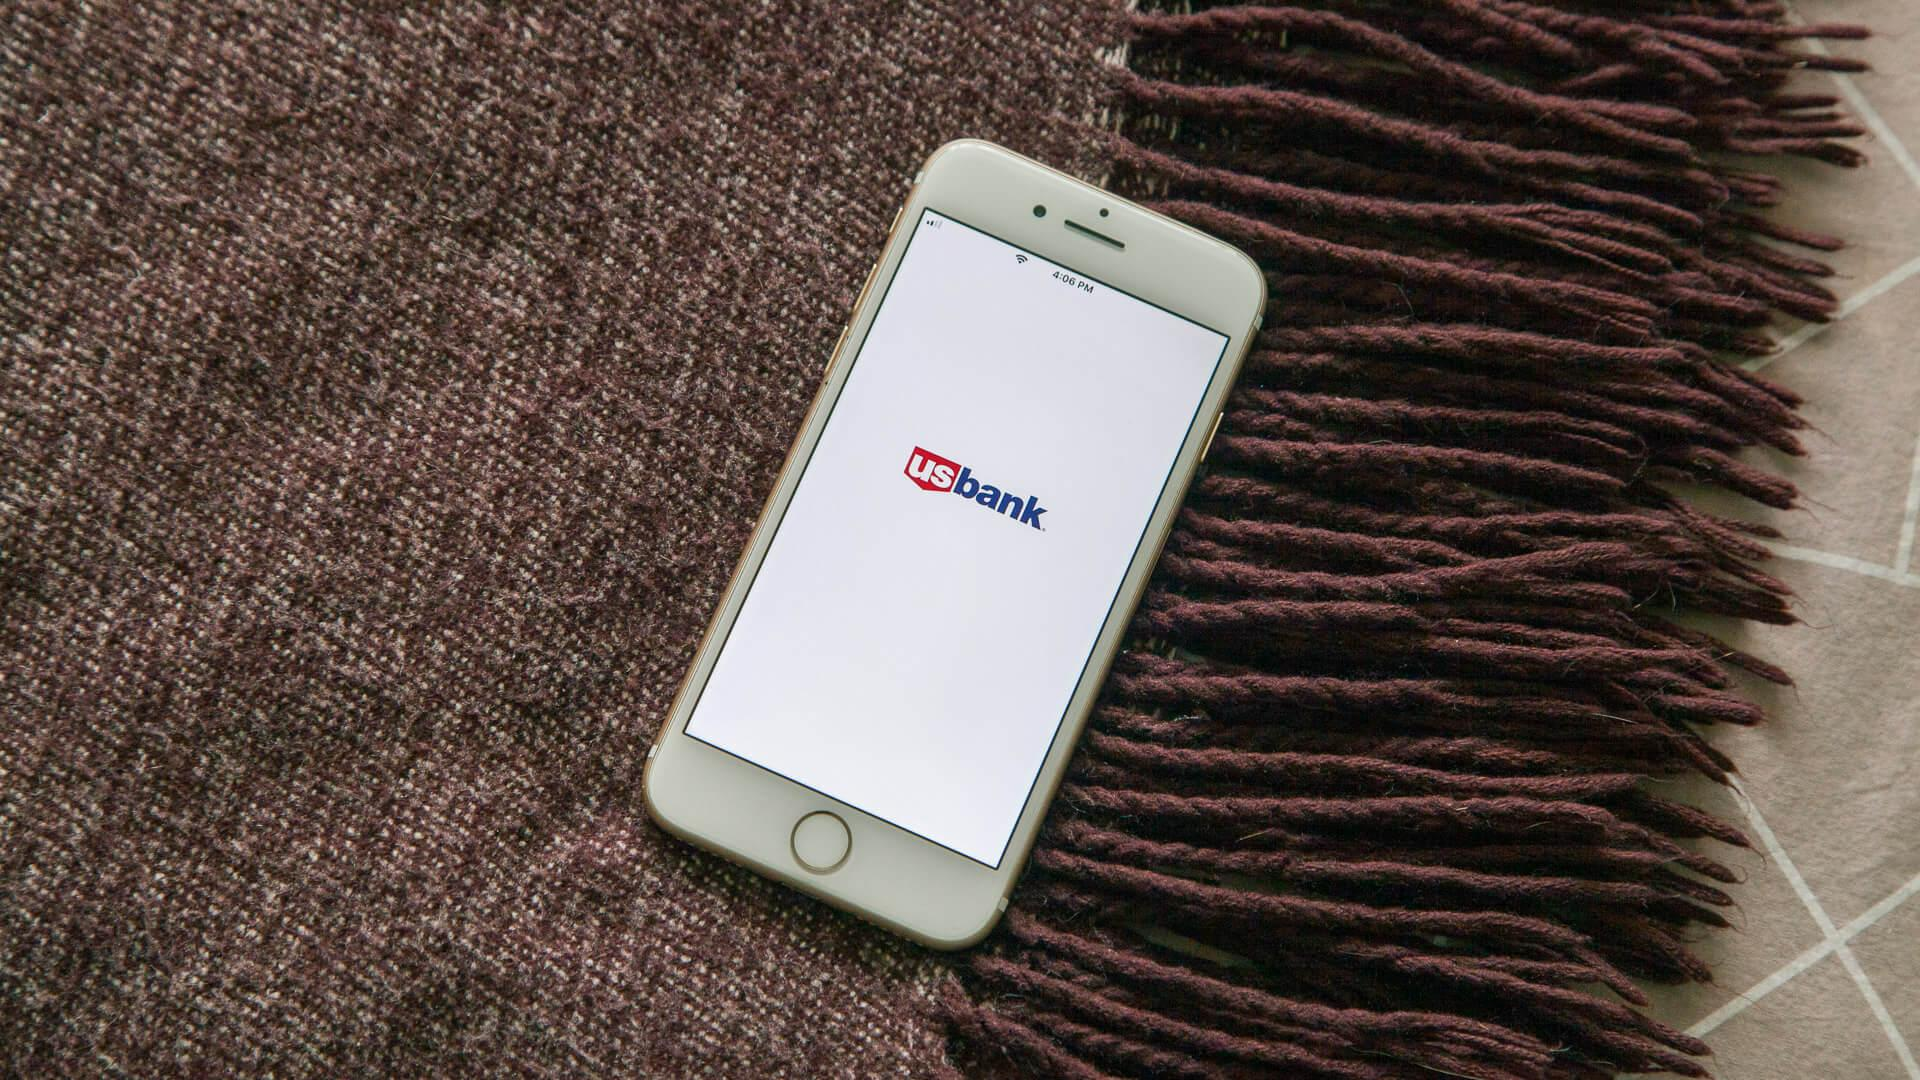 US Bank financial services app